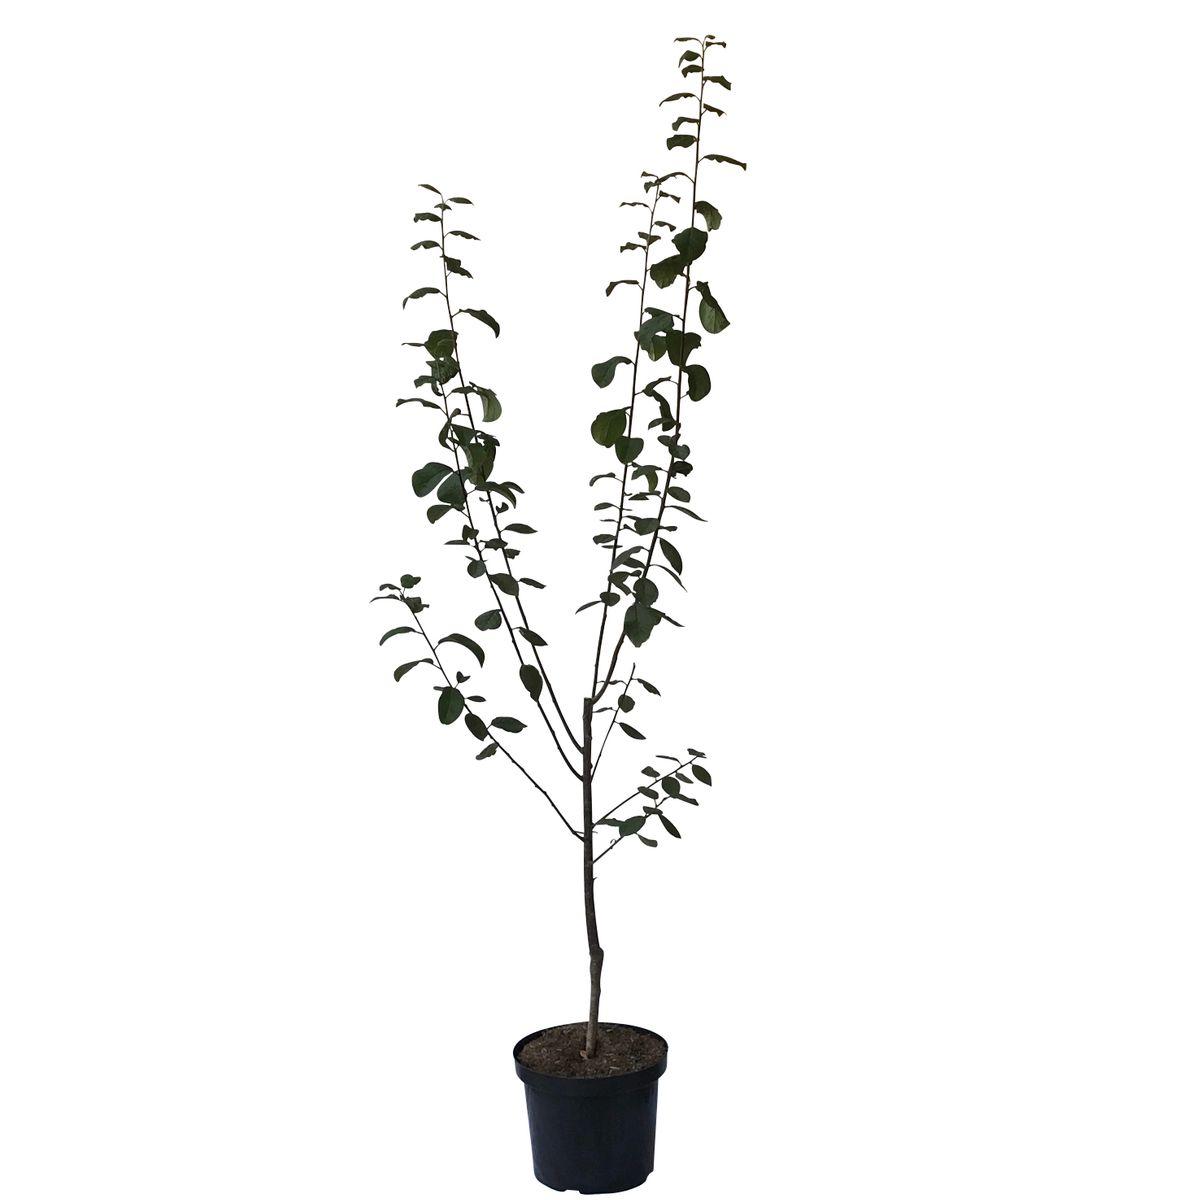 k nigin viktoria goldgelbe pflaume einj hriger buschbaum 100 120 cm 7 5 liter topf st julien a. Black Bedroom Furniture Sets. Home Design Ideas